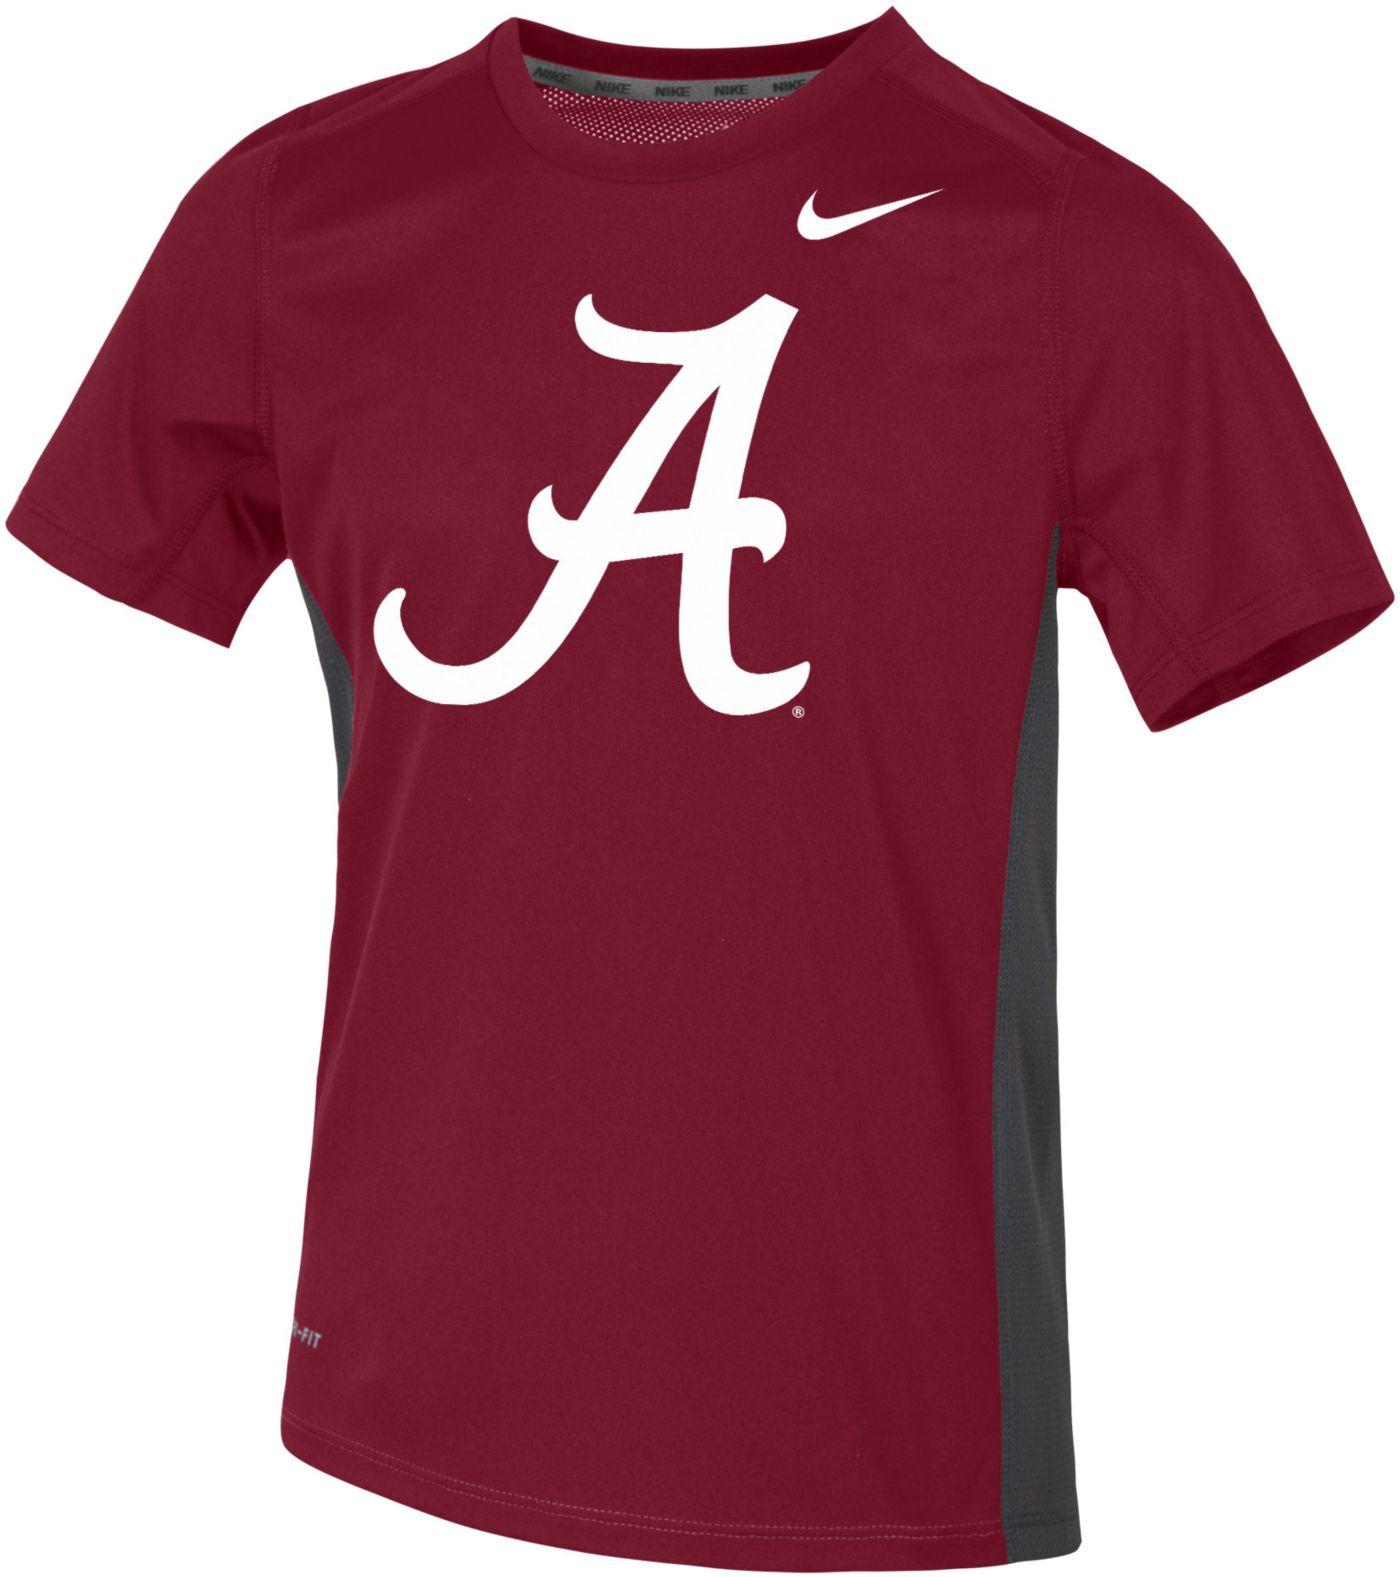 Nike Youth Alabama Crimson Tide Crimson Dri-FIT Miler T-Shirt